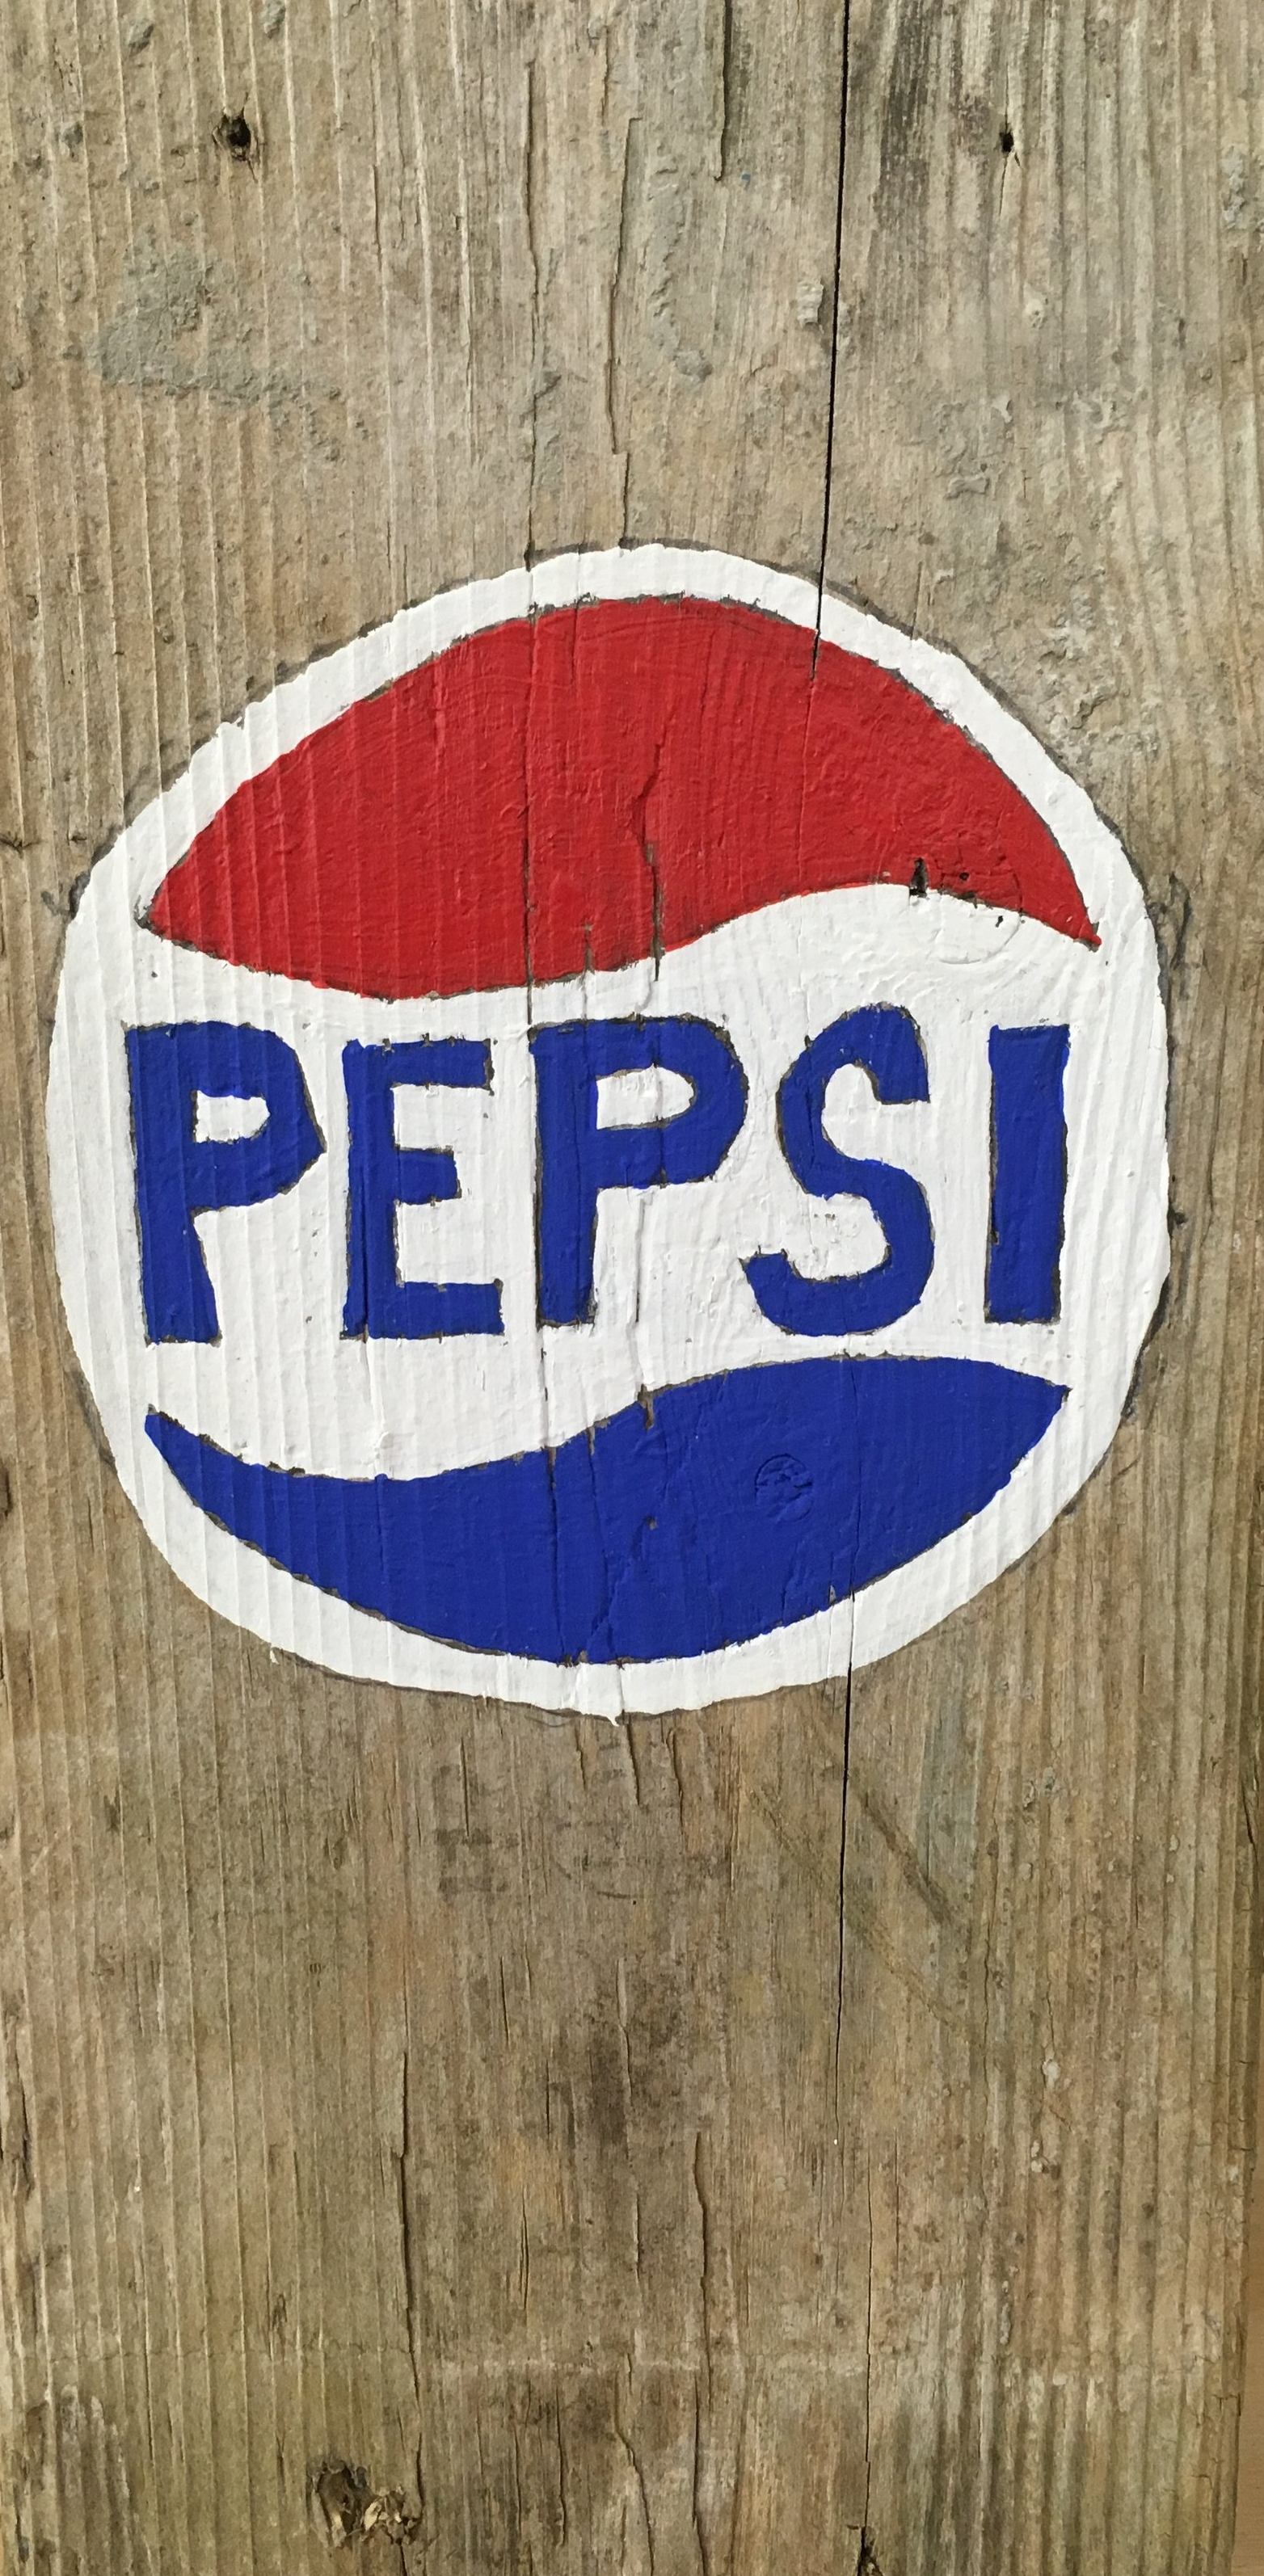 Romas Astrauskas,Untitled (Pepsi), 2017, acrylic on wood, 11 X 5.5 inches